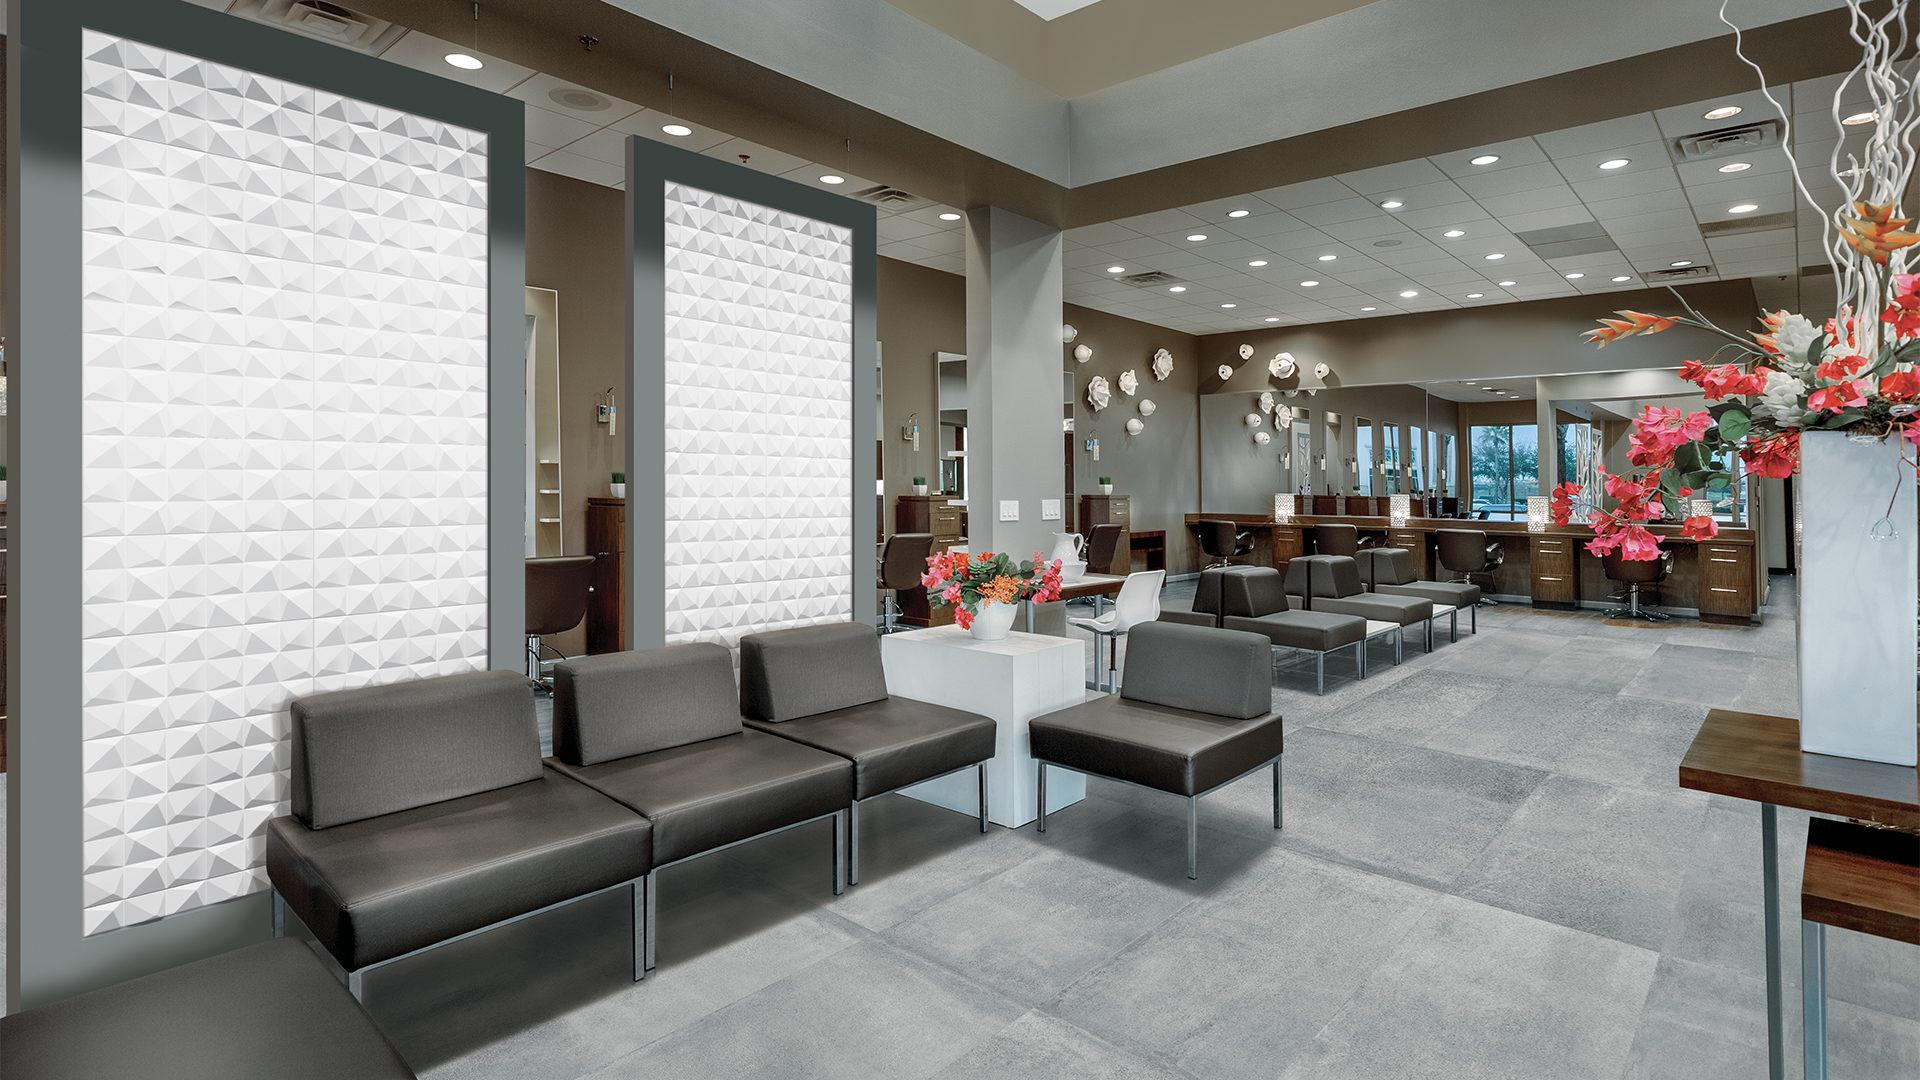 69-985-12x24-linea-white-prizmatic-glossy-rect-wall-tile-lifestyle-l-1920x1080.jpg